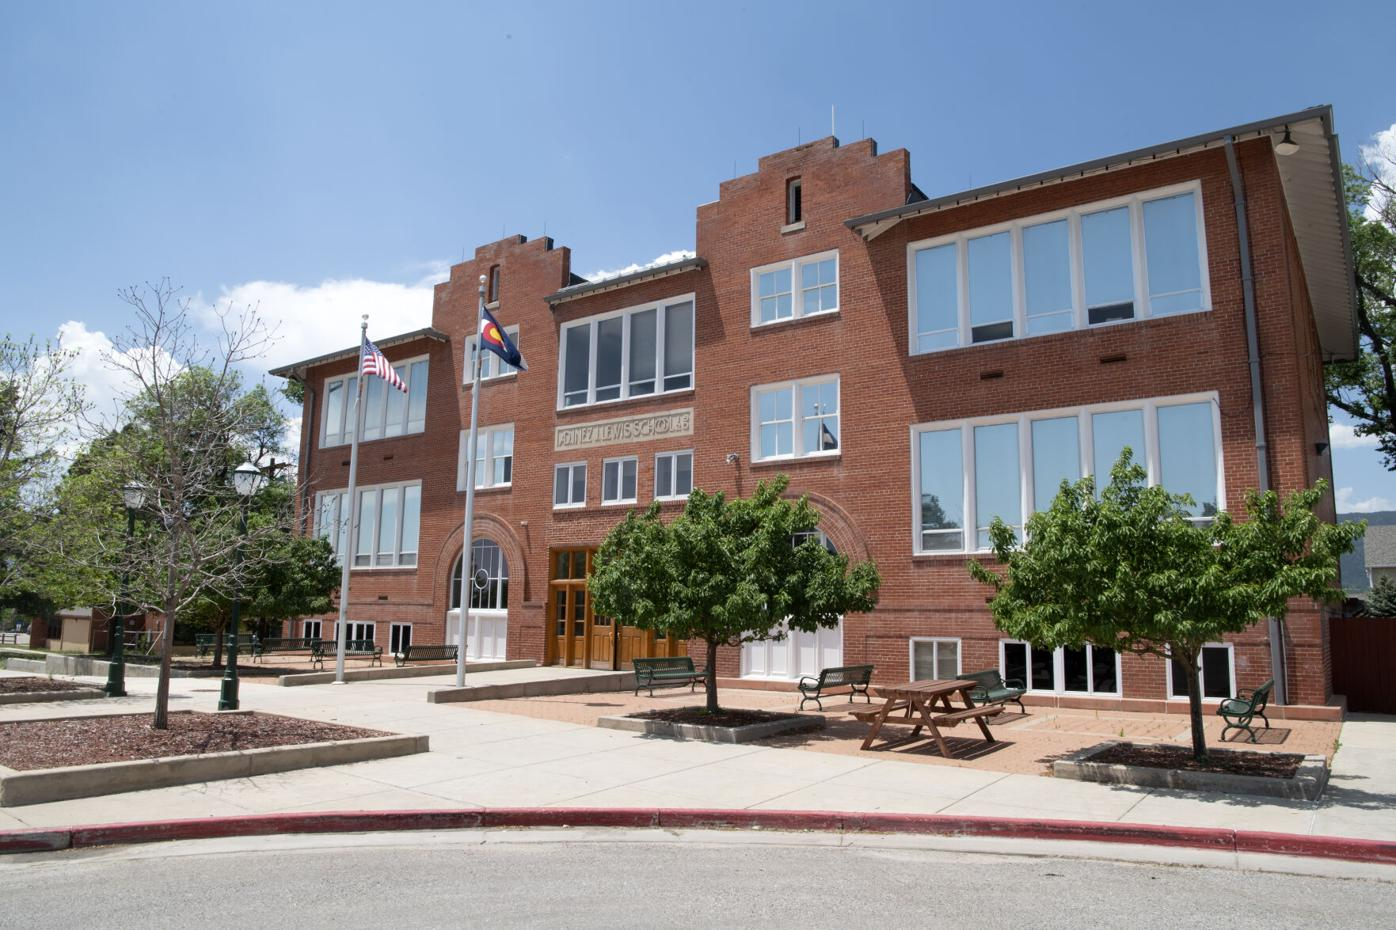 Lewis-Palmer School District 38 administration building